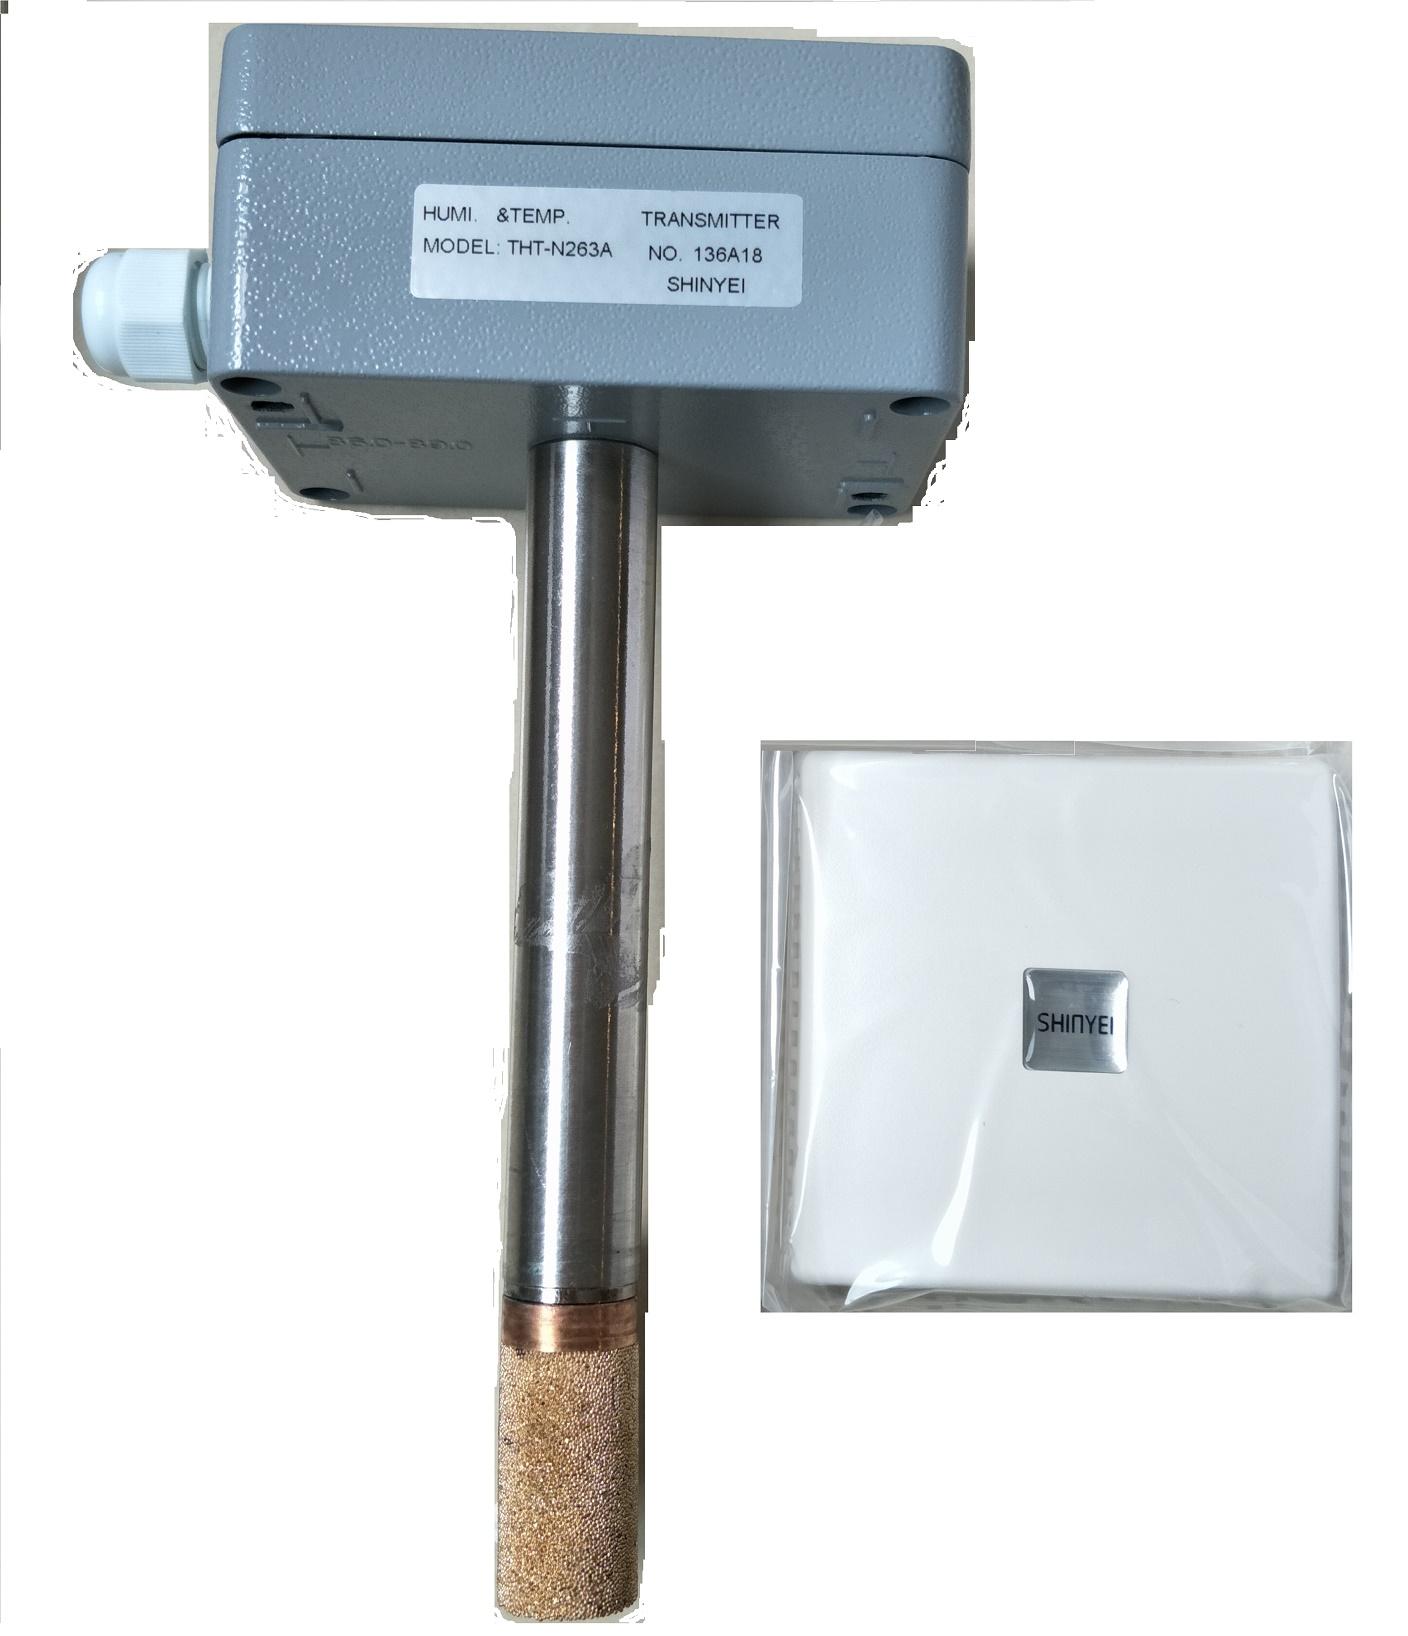 THT-N263A SHINYEI 神荣风管温湿度变送器现货批发零售